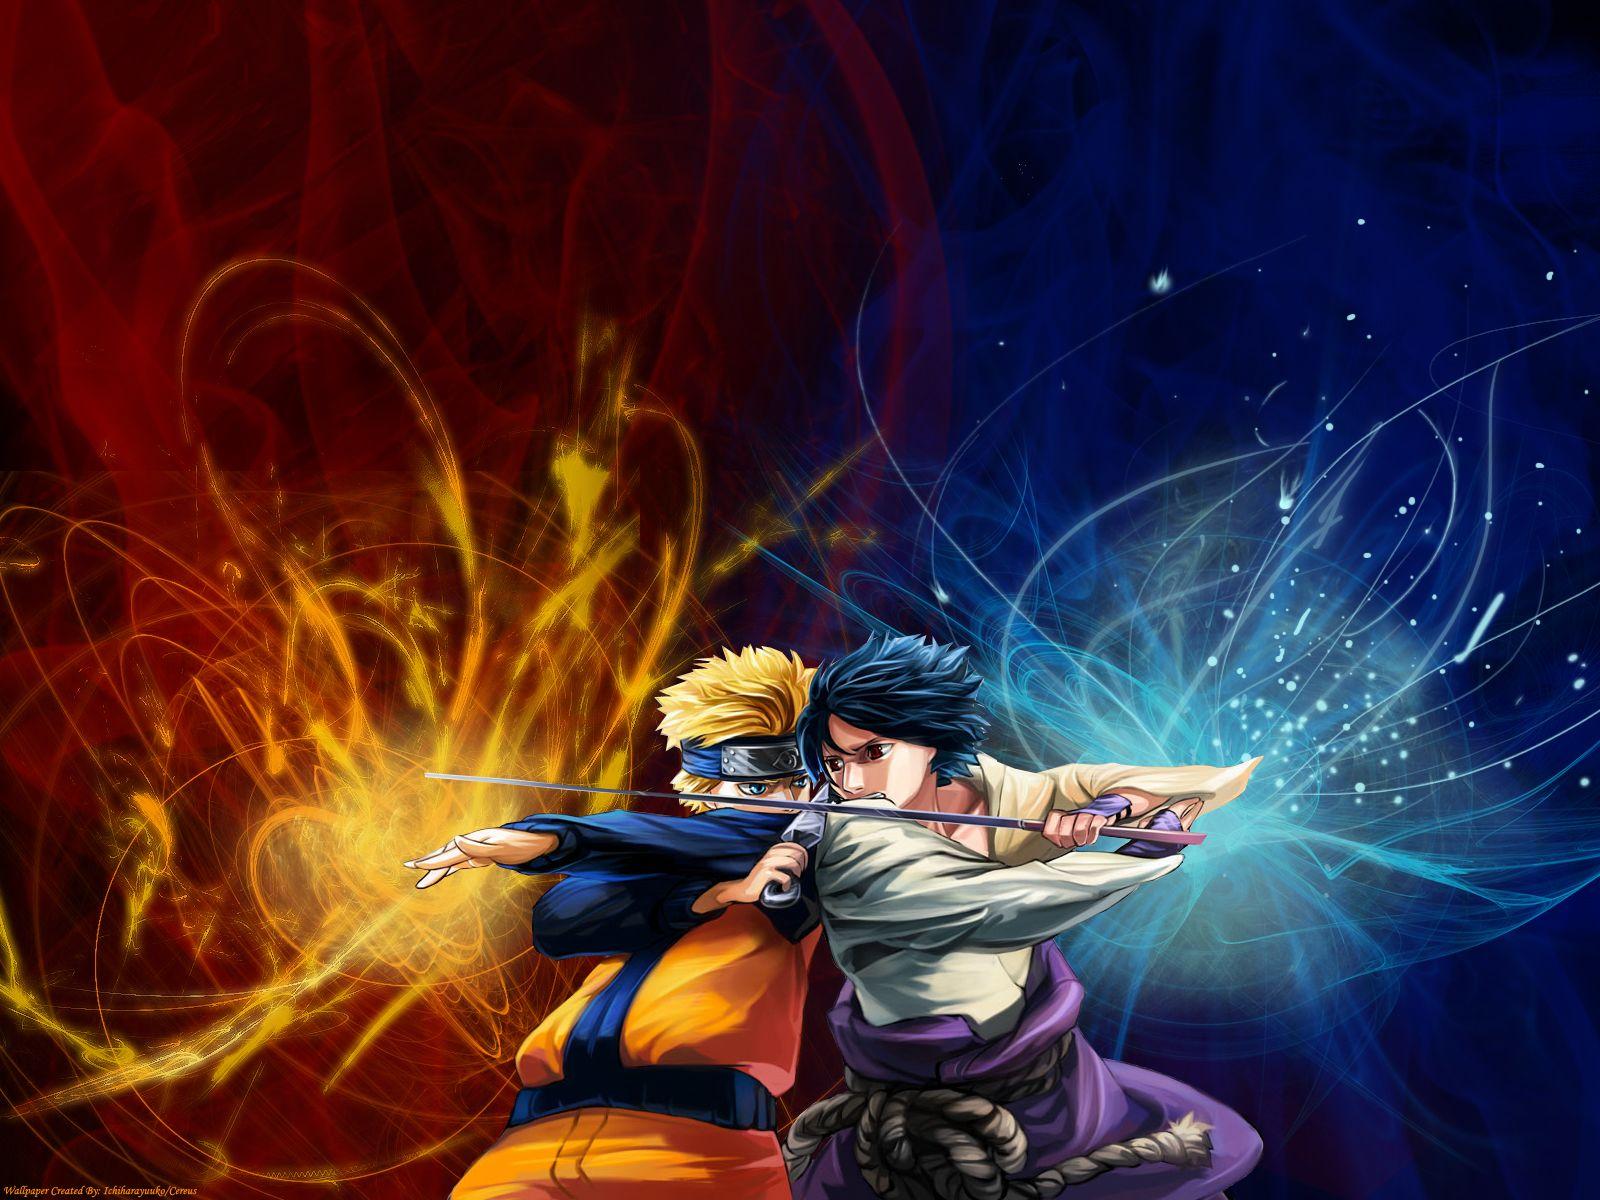 Naruto vs sasuke shippuden batalla final